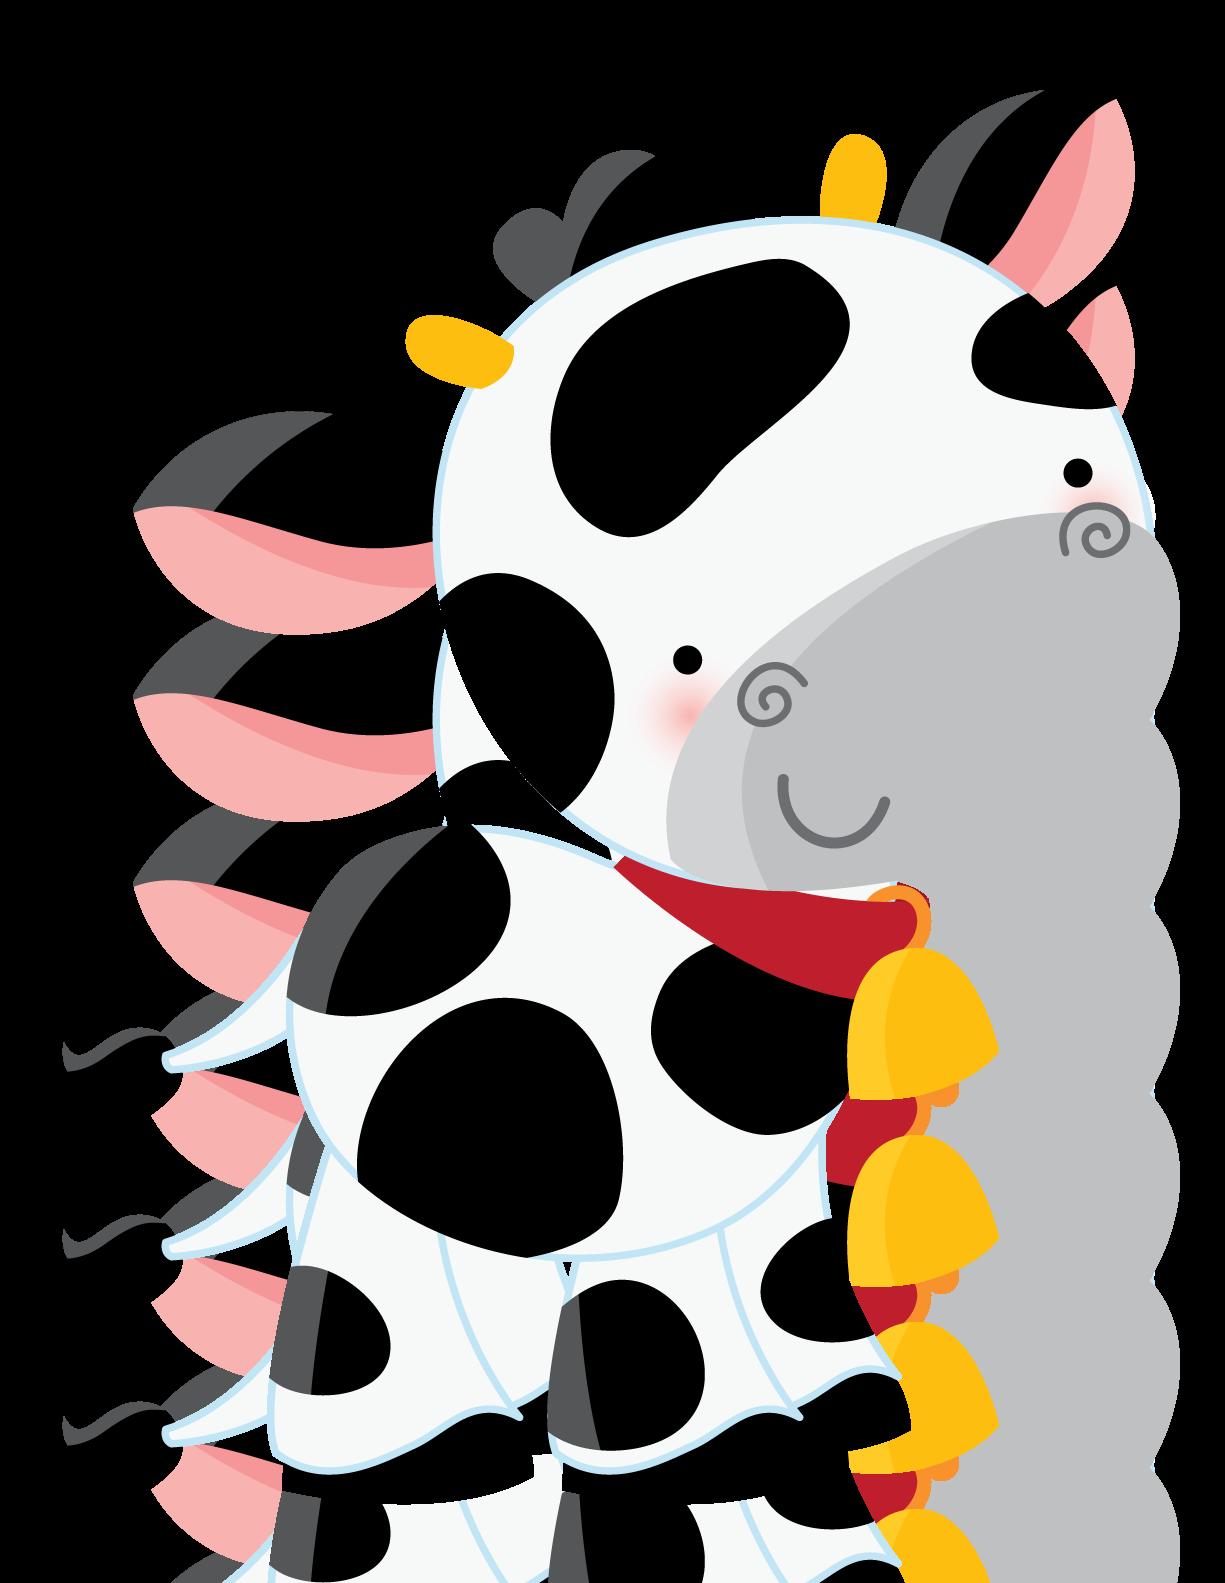 vector royalty free Iuwvcv oi cq png. Baby farm animal clipart